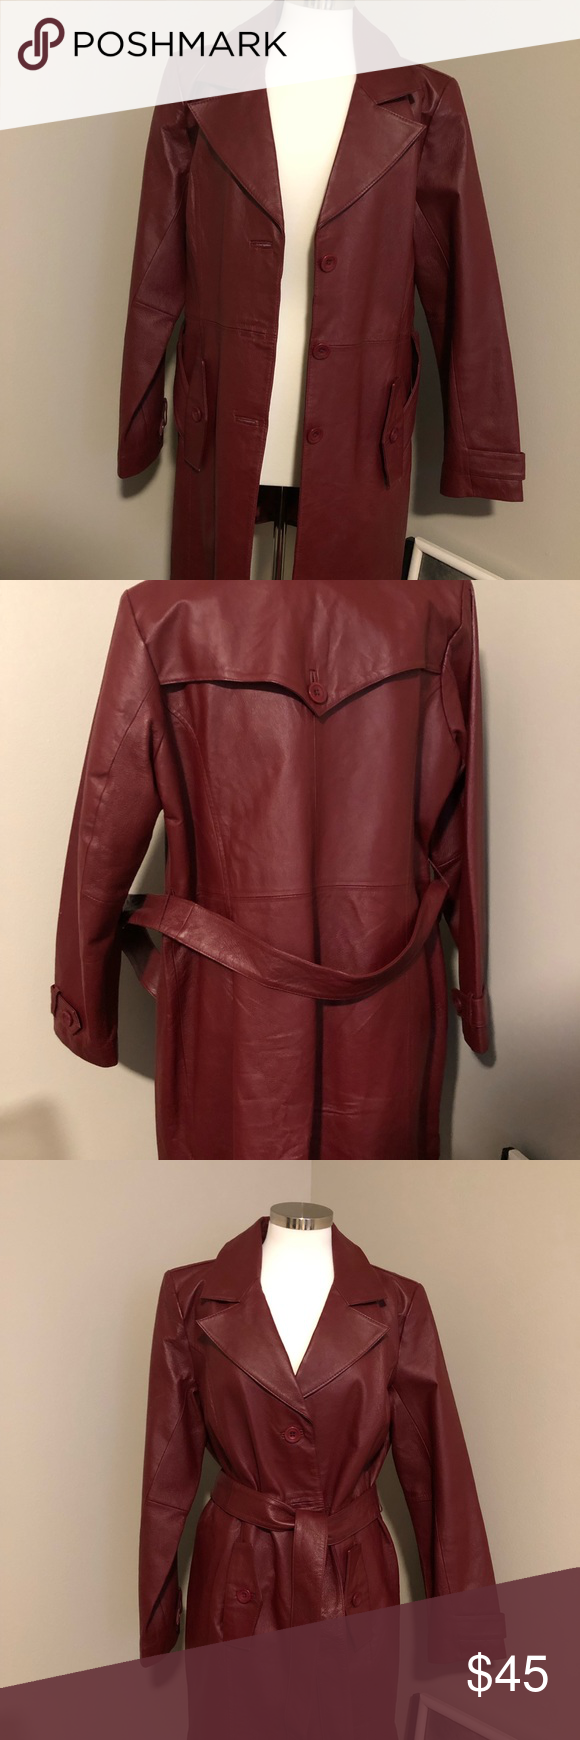 Leather Jacket Women S 3 Quarter Length Belted Burgundy Leather Jacket Never Worn Centigrade Jac Leather Jacket Leather Jackets Women Burgundy Leather Jacket [ 1740 x 580 Pixel ]